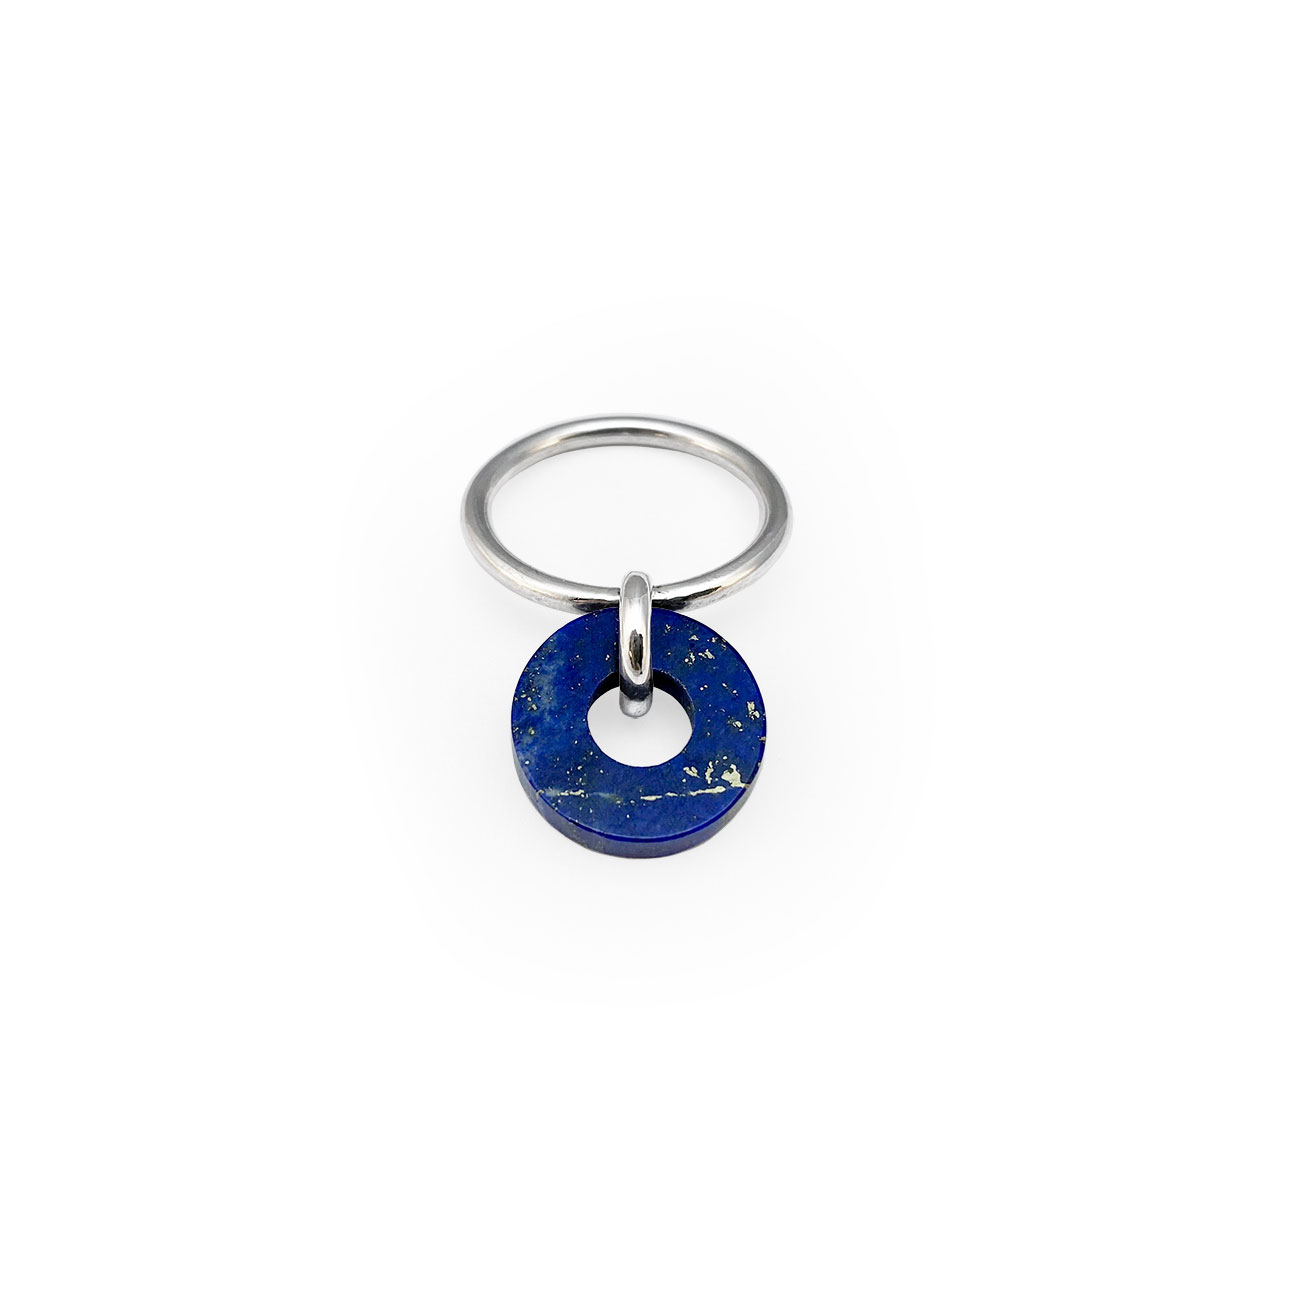 metaformi_design_jewelry_loop_lapis_silver_ring